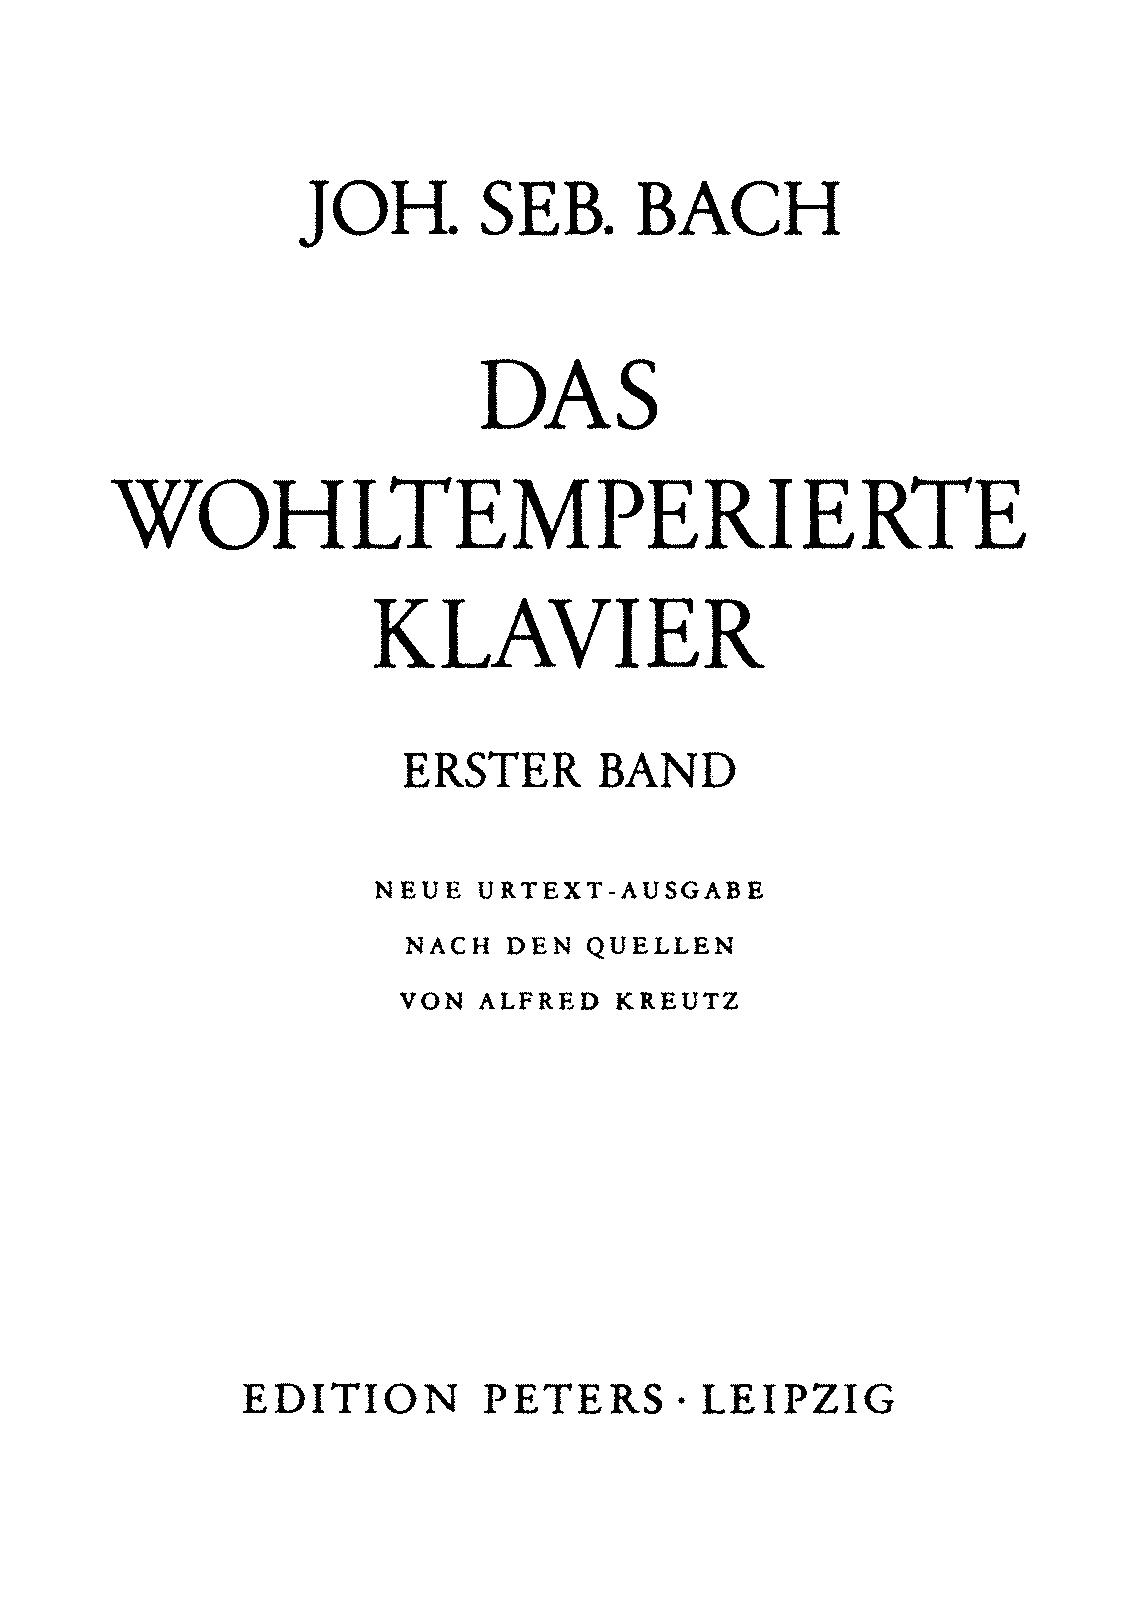 Das wohltemperierte Klavier I, BWV 846-869 (Bach, Johann Sebastian) -  IMSLP: Free Sheet Music PDF Download